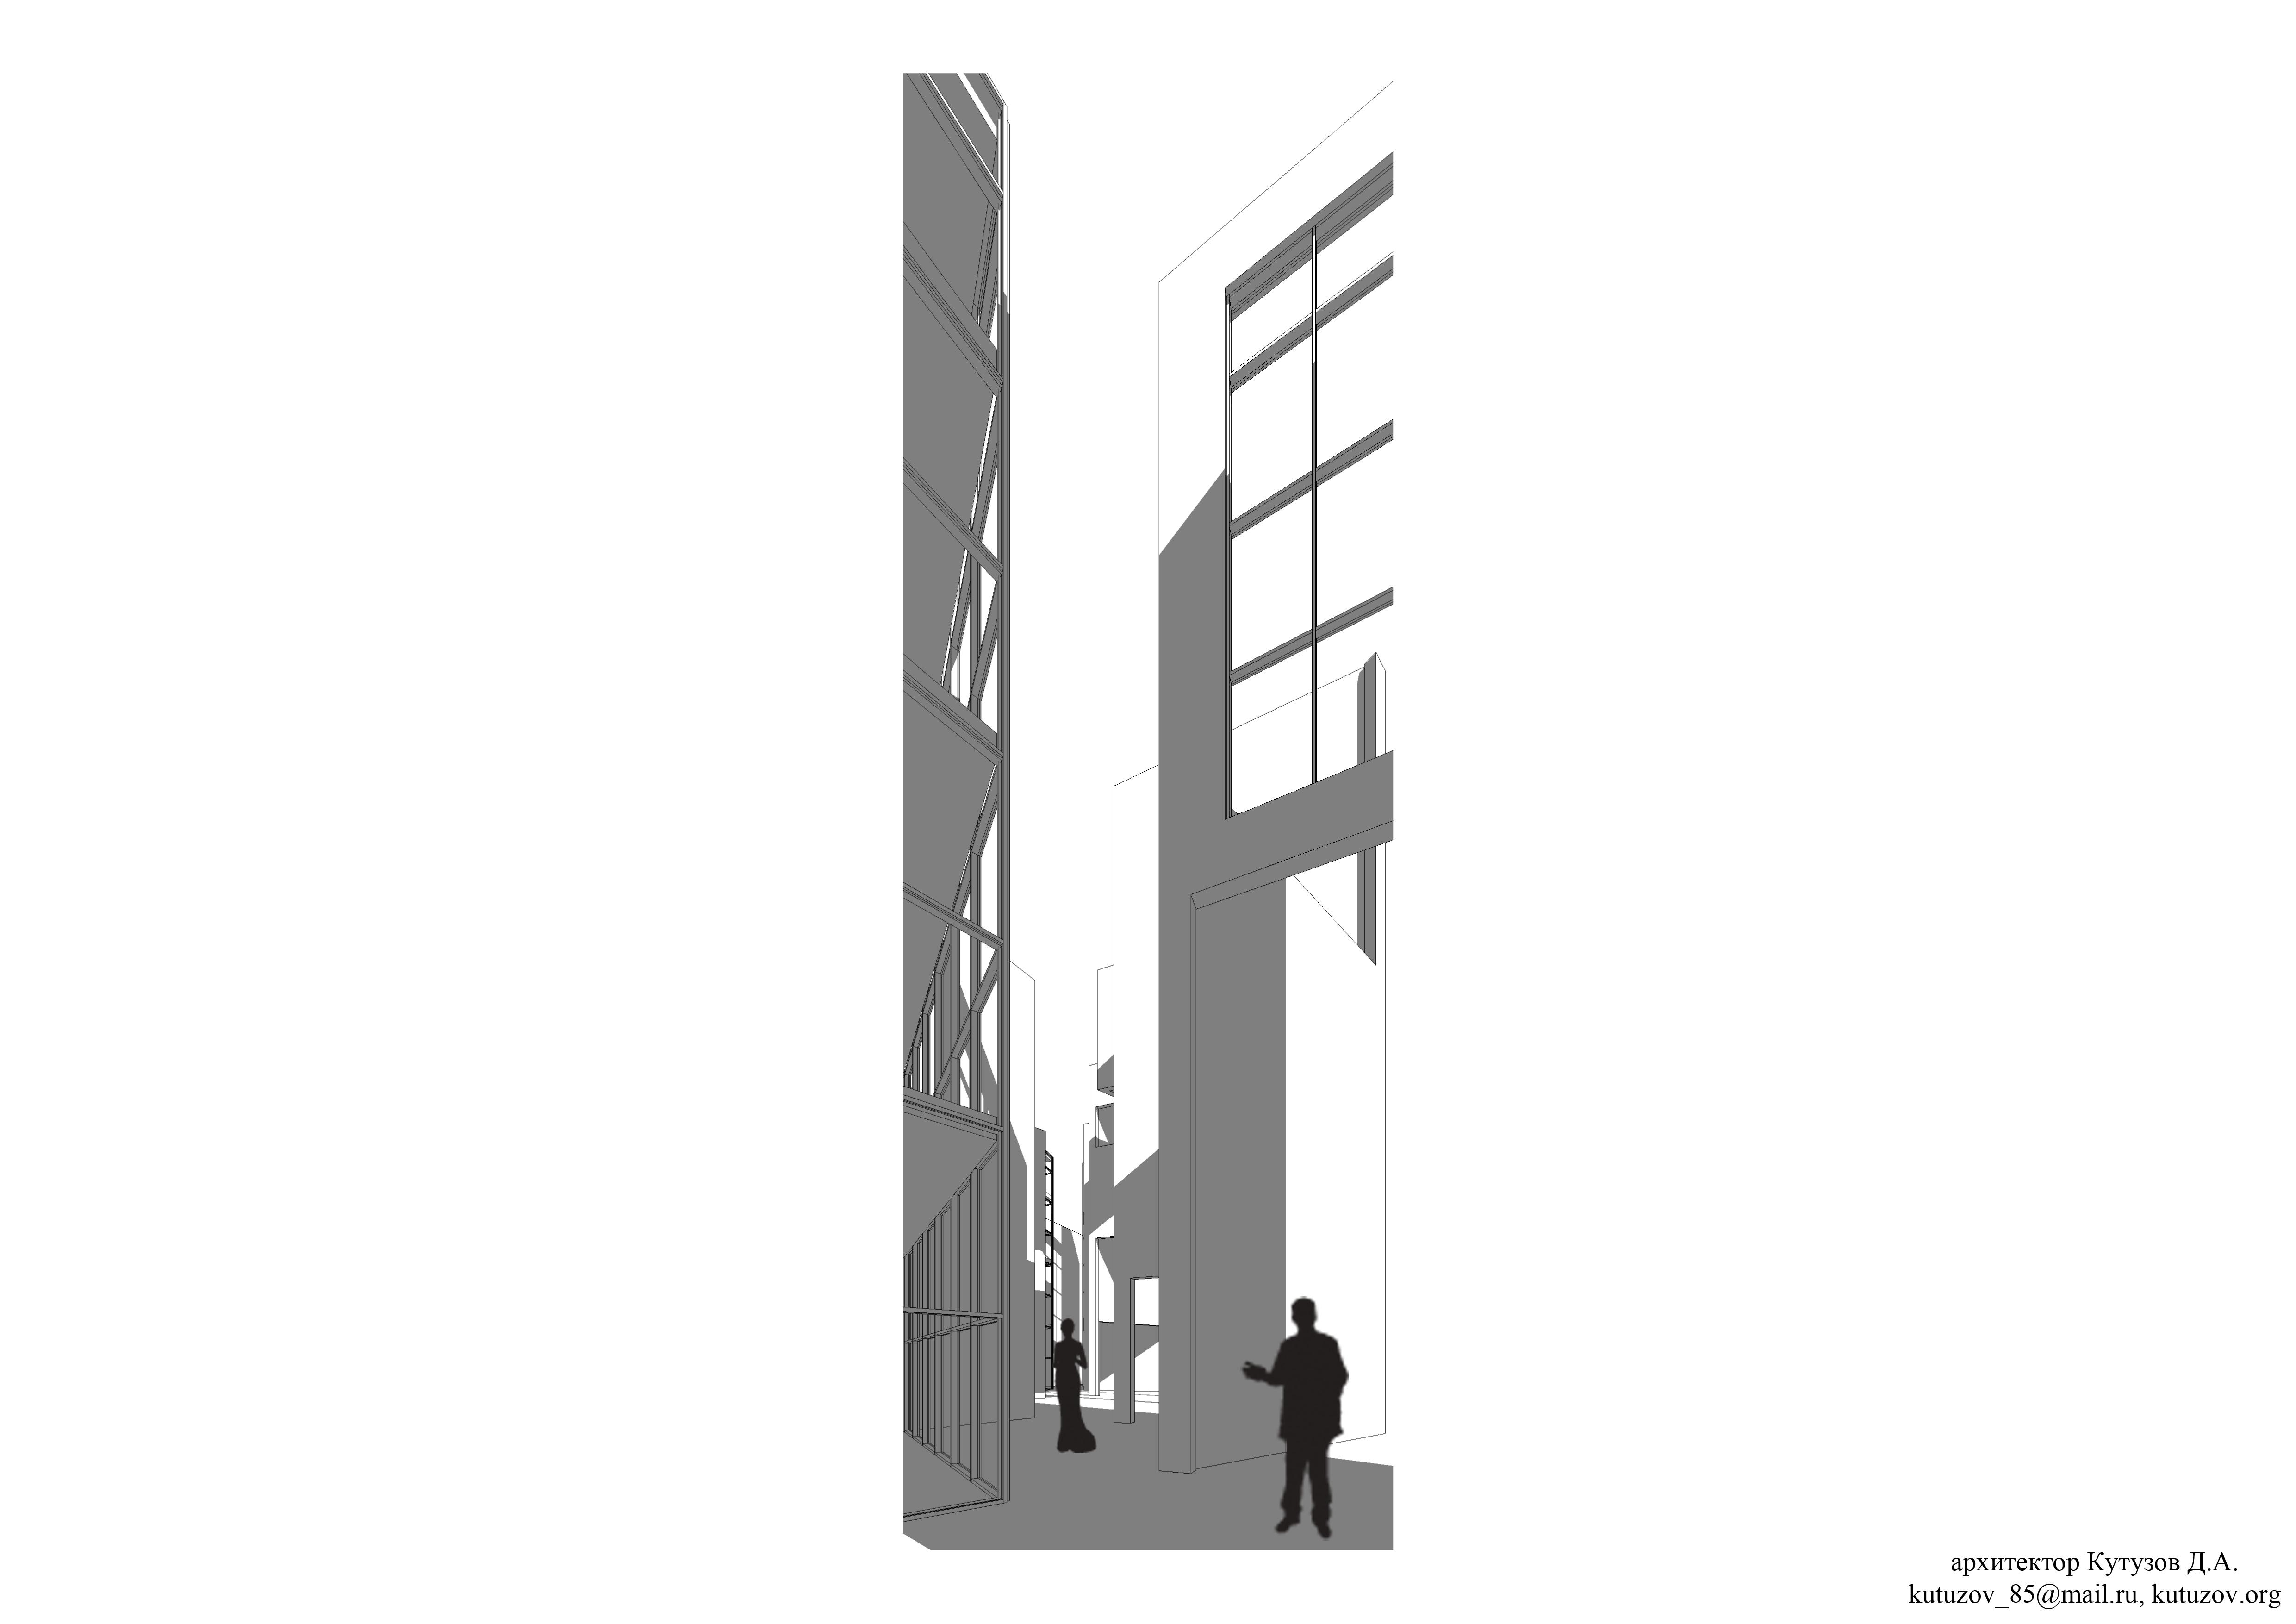 Разработка архитектурной концепции театра оперы и балета фото f_16652ee8efdbe46b.jpg